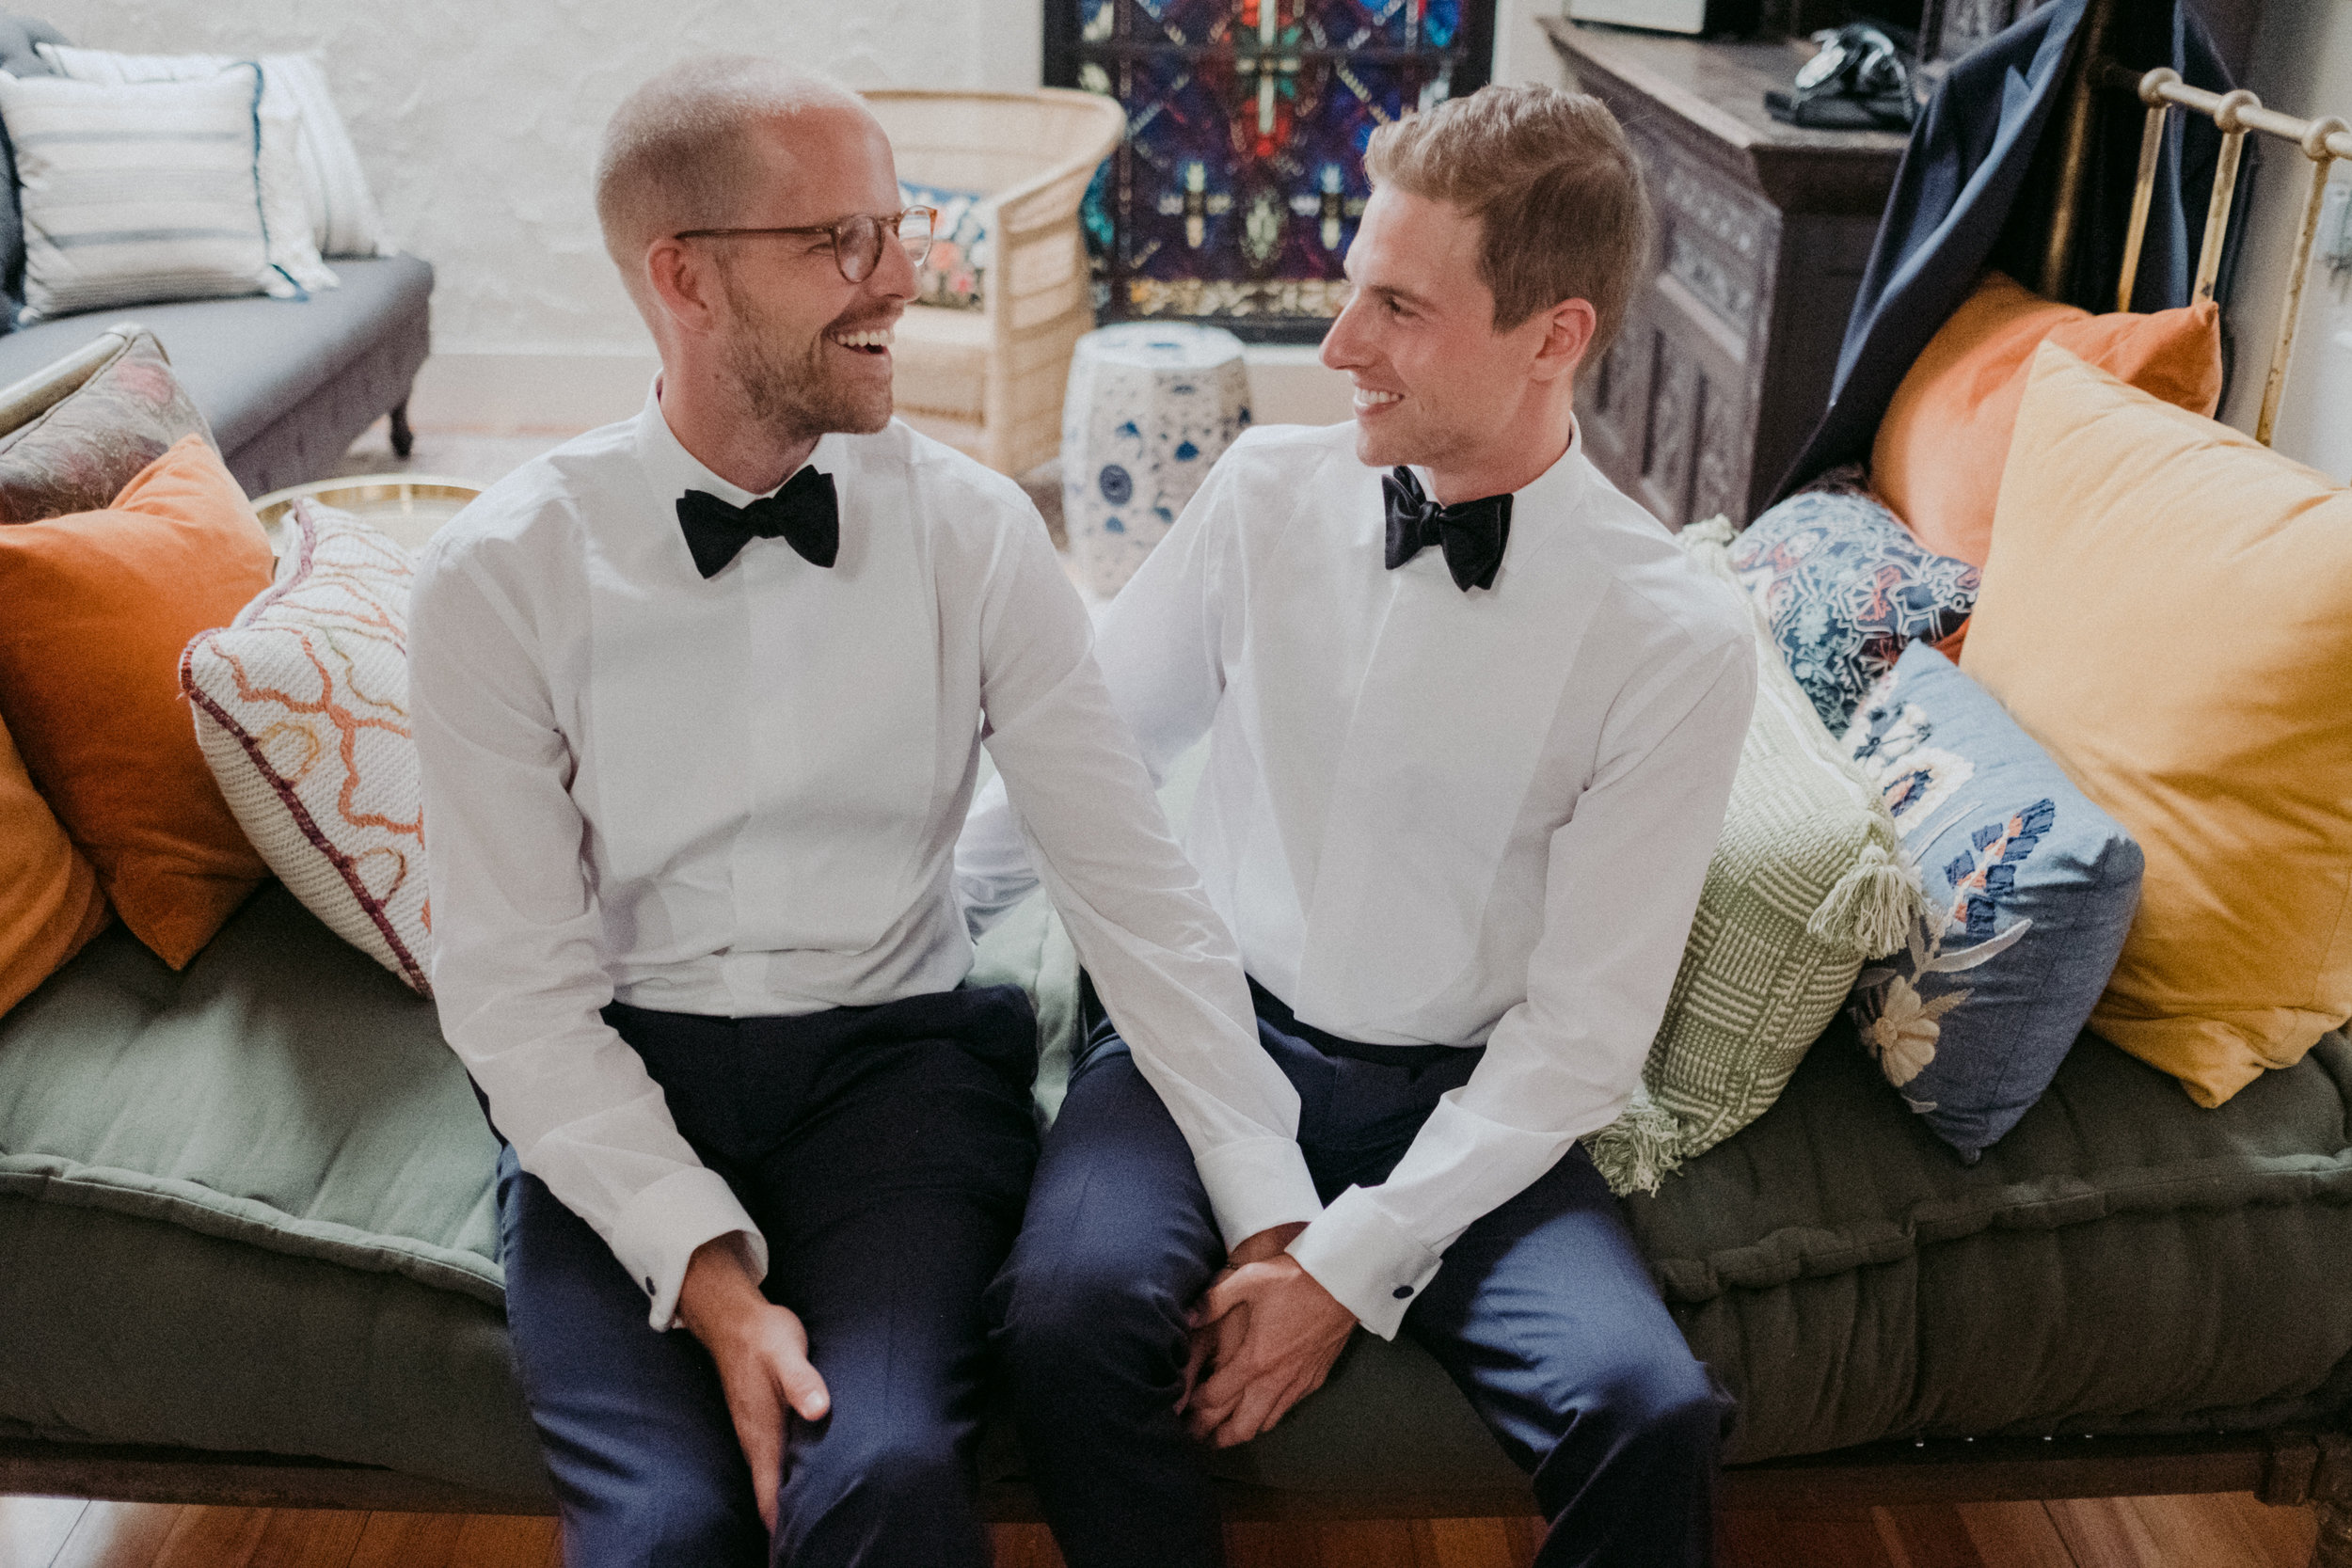 Same Sex Wedding in Provincetown, MA. Destination wedding planned by Nicole Simeral. Coastal Chic Wedding, Travel Wedding, Sperry Sailcloth Tent Wedding.  Getting Ready